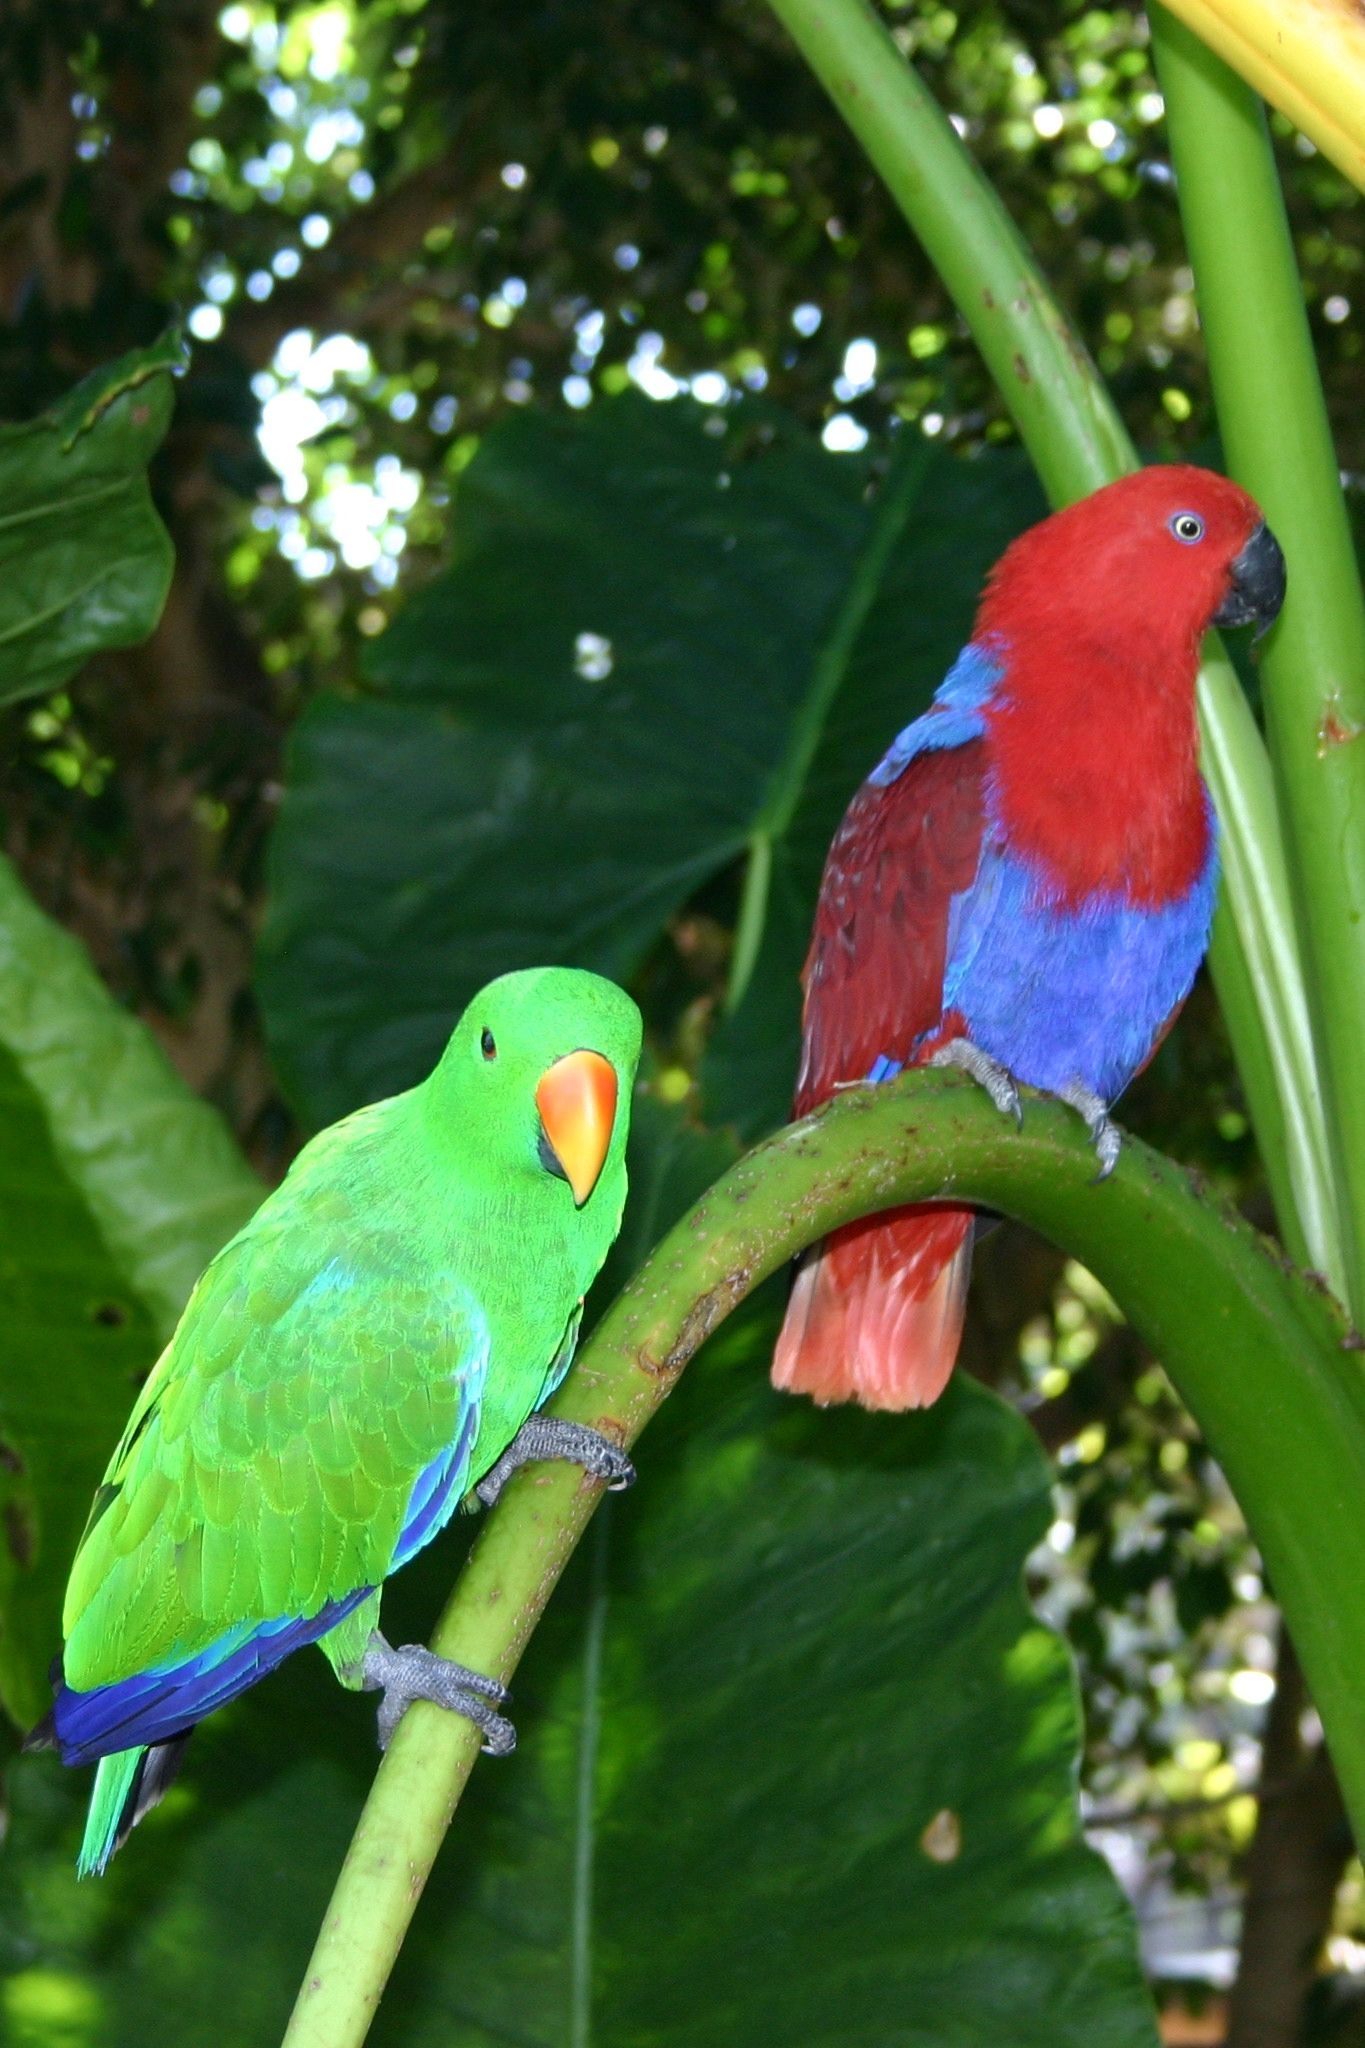 Daintree Rainforest, Australia Australian birds